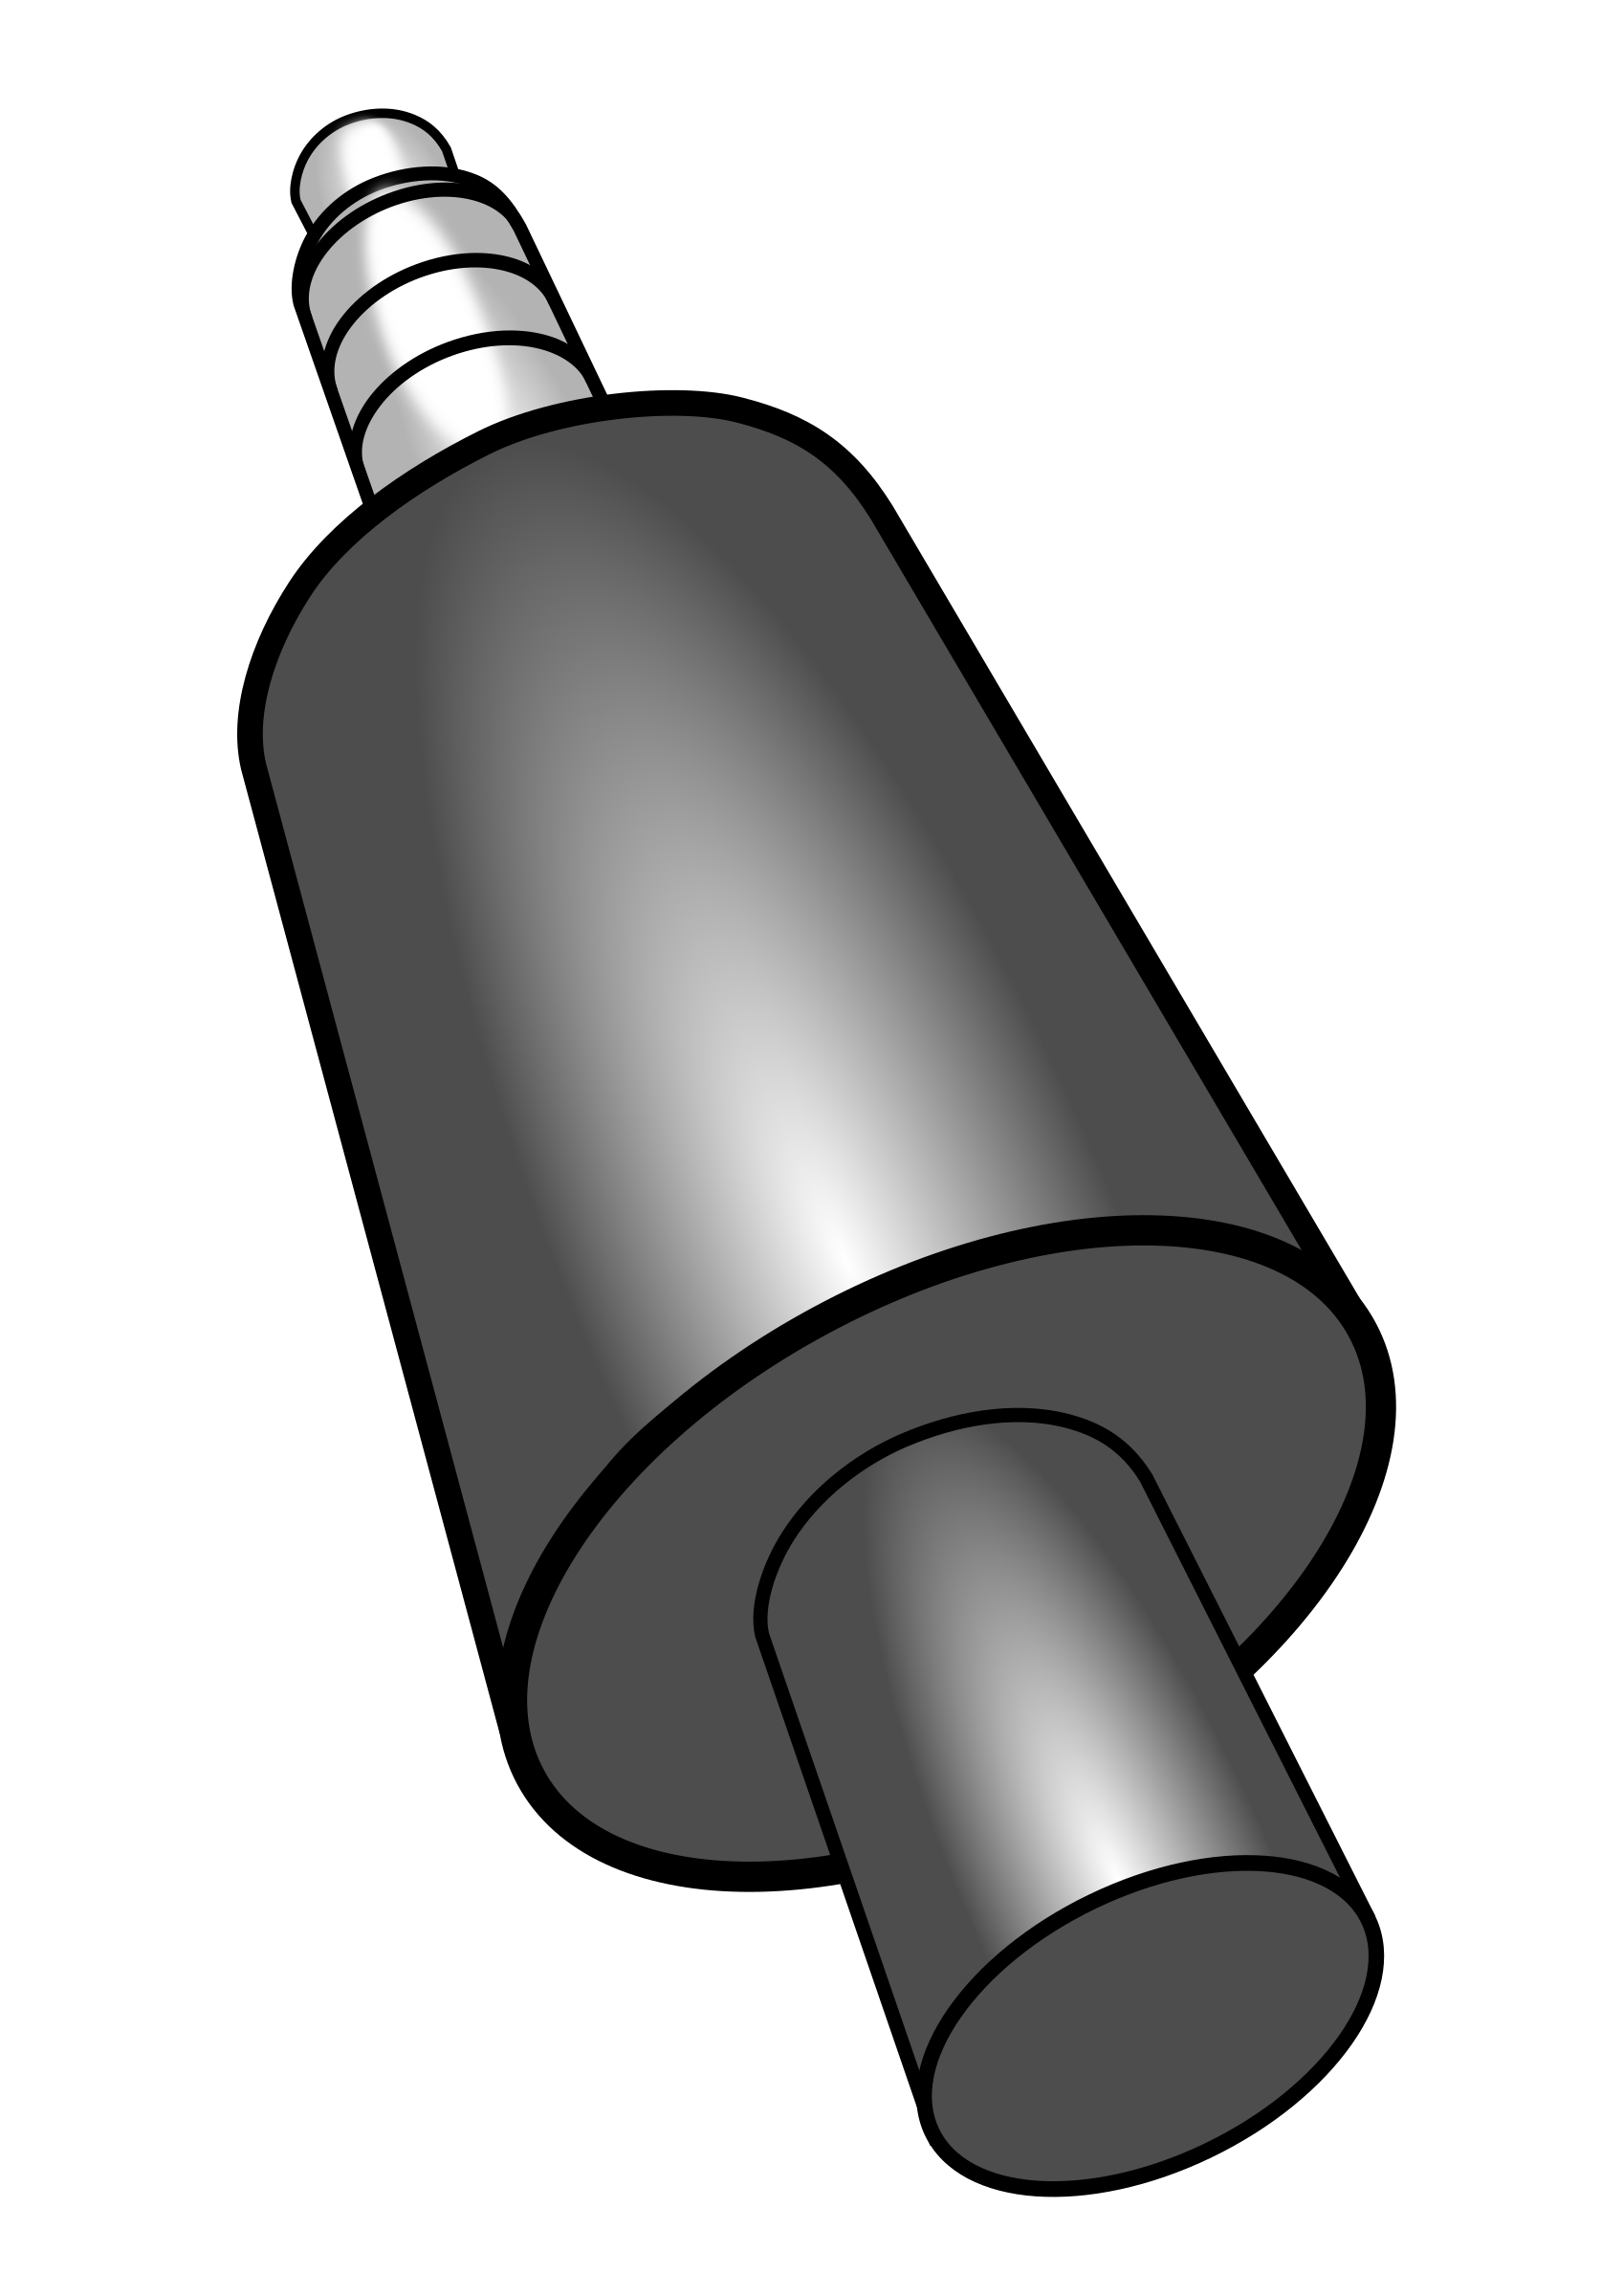 Clipart - Headphone Plug Stereo Plus Mic 3D